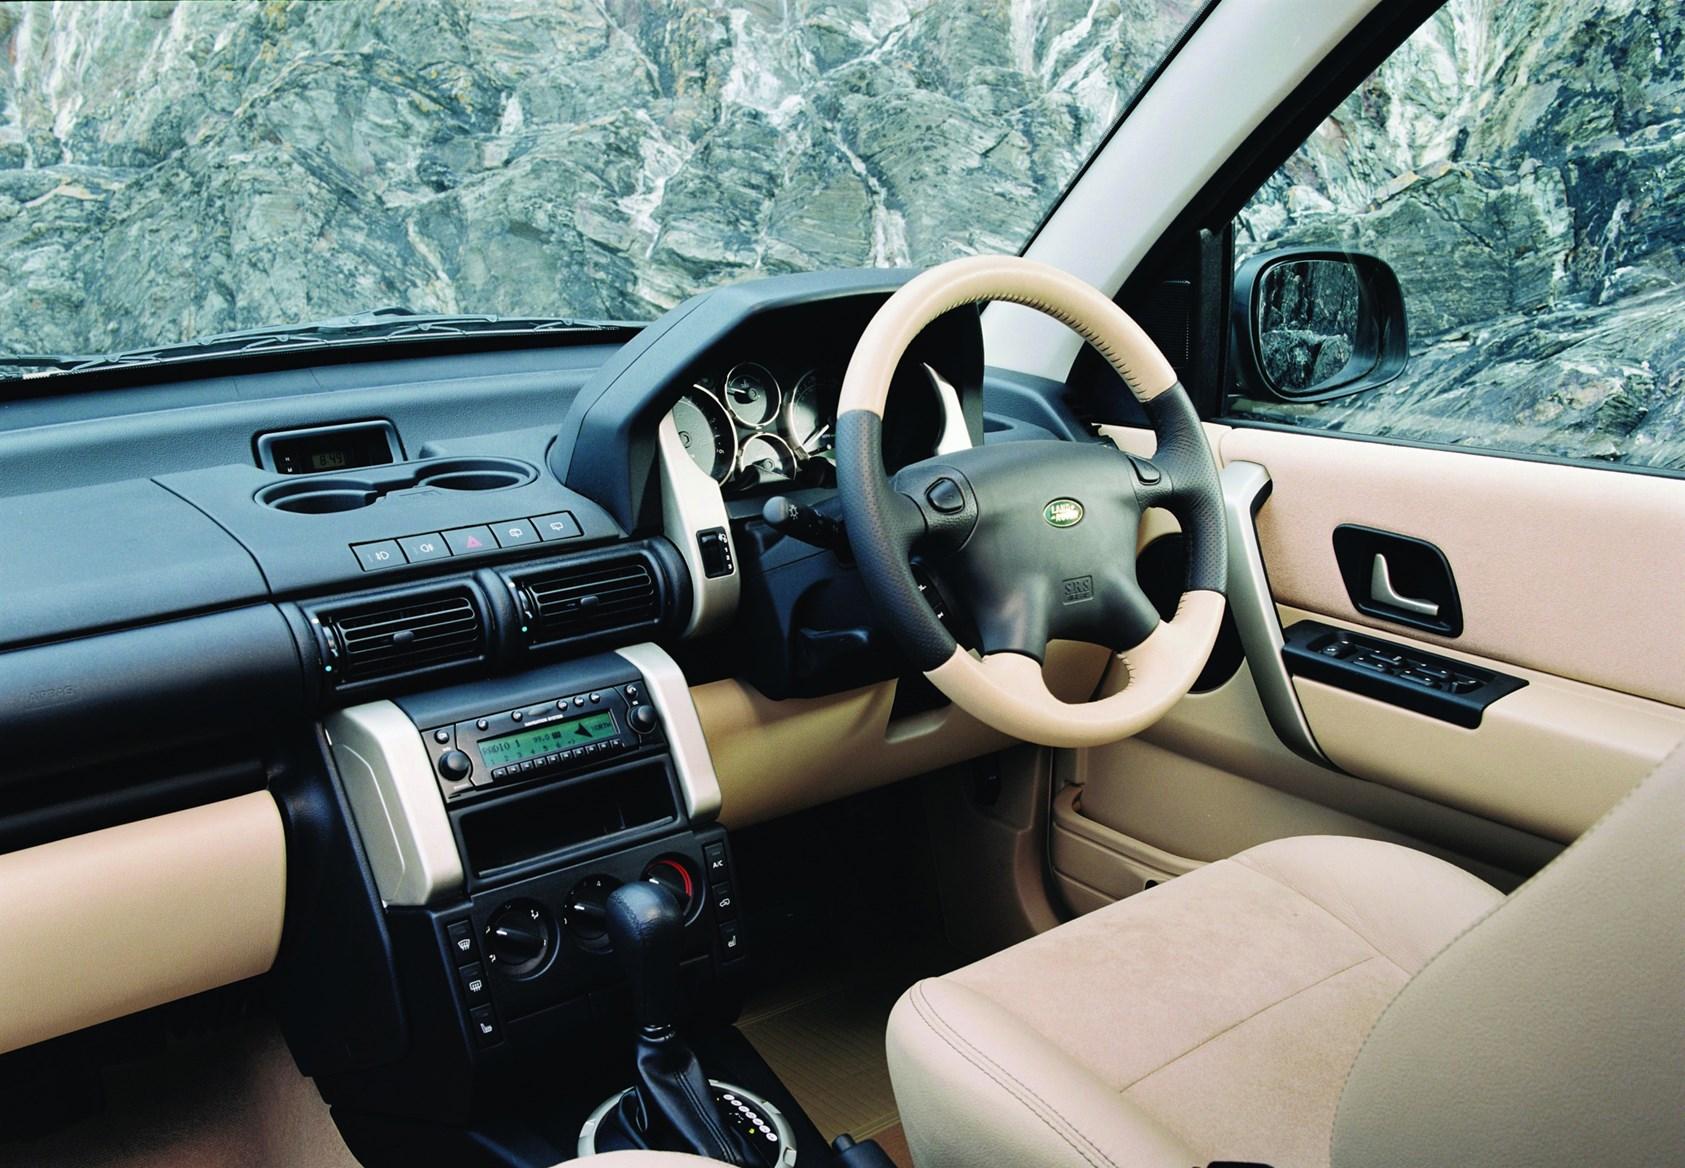 hard freelander for rover p history s mot es lpg f long conversion auto land landrover top sale